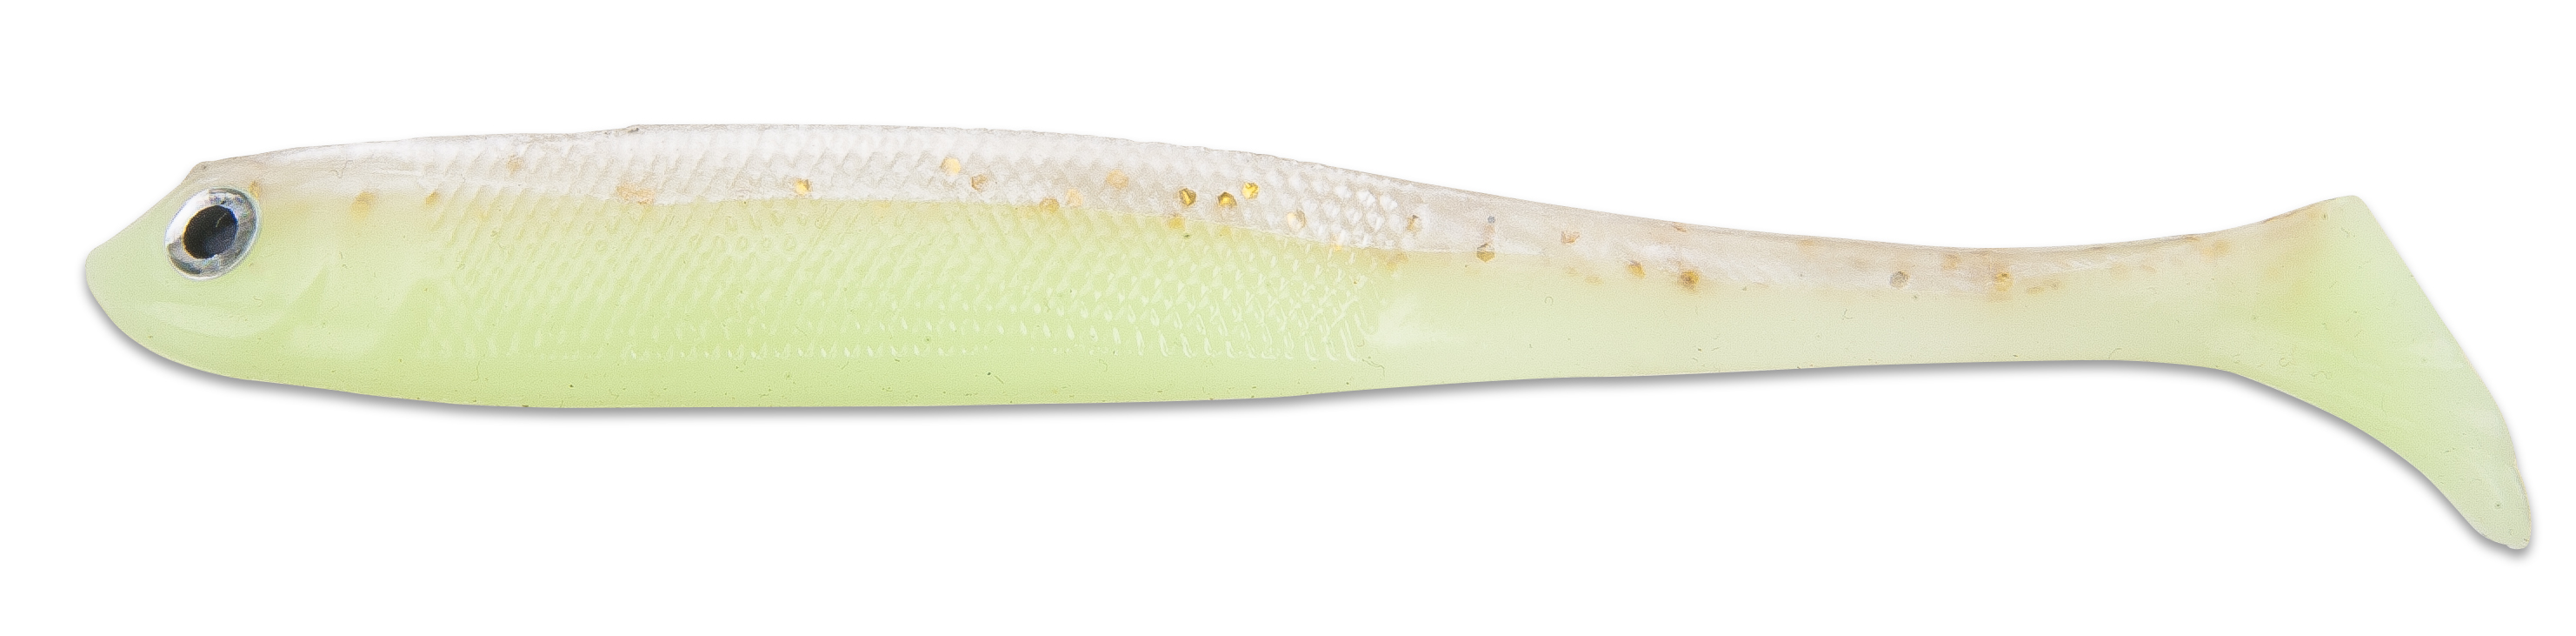 Iron Claw gumová nástraha Slim Jim 10 cm Vzor LU, 3 ks